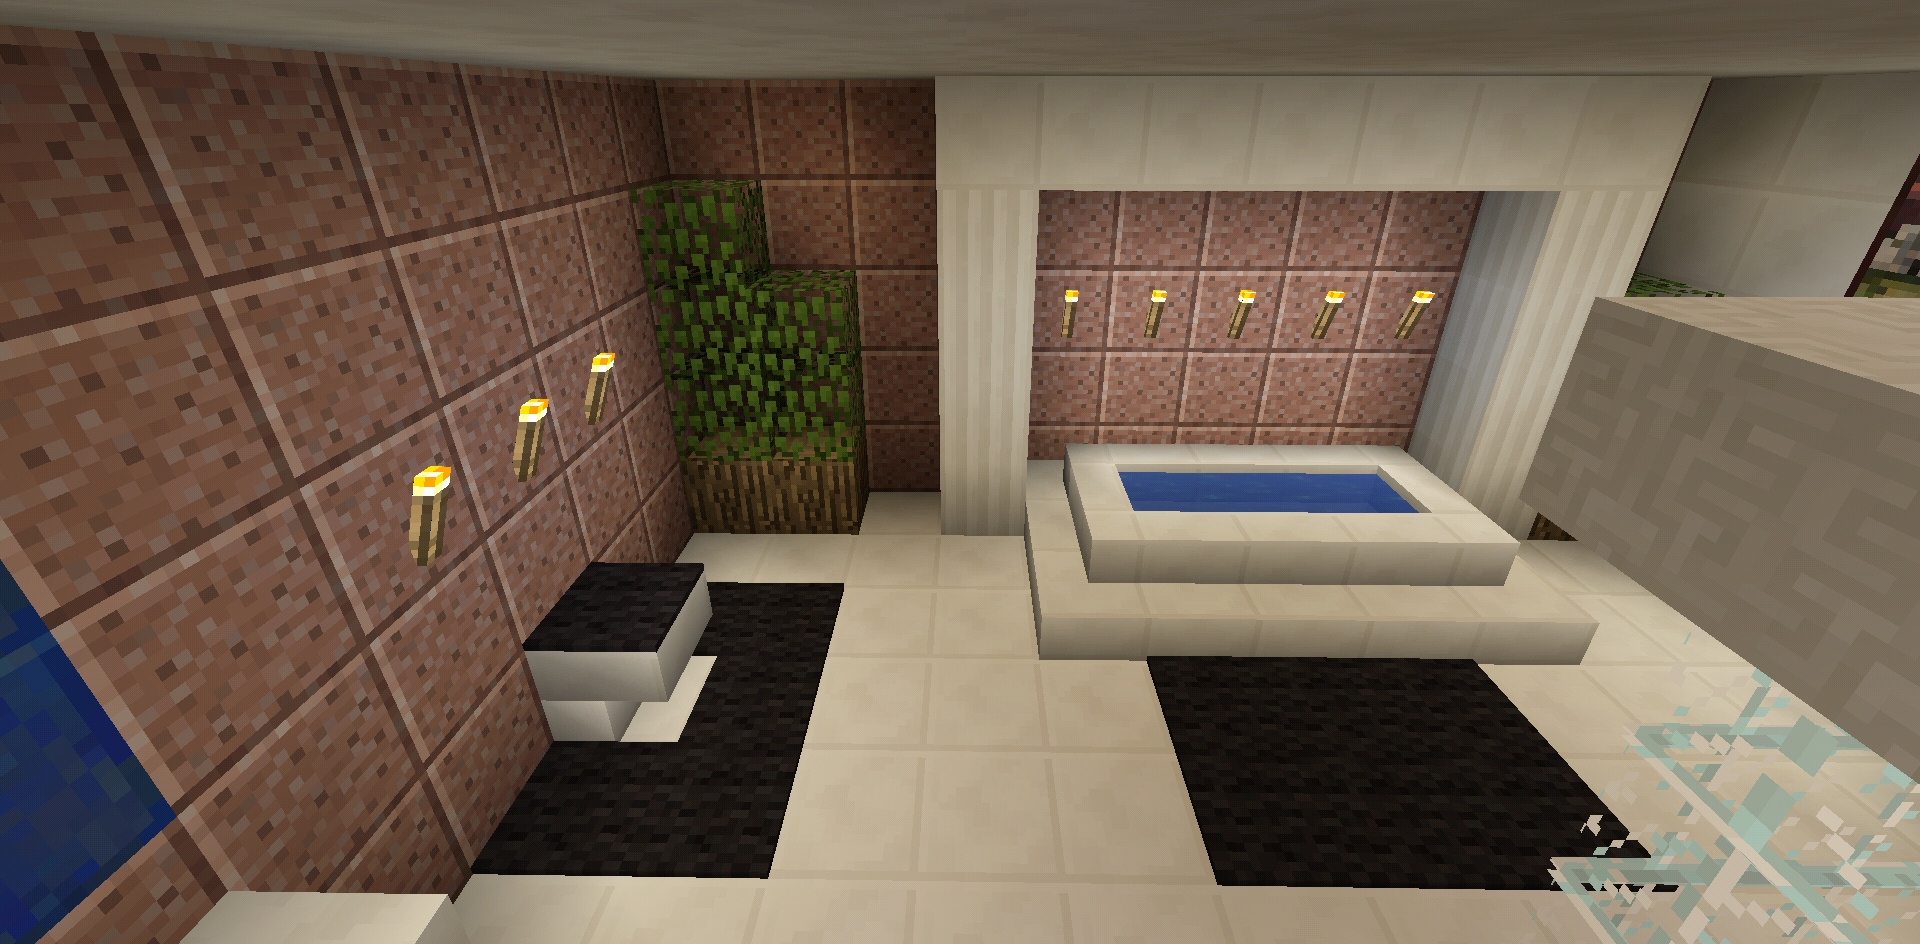 Minecraft Bathroom Garden Tub Toilet   Minecraft bedroom ...